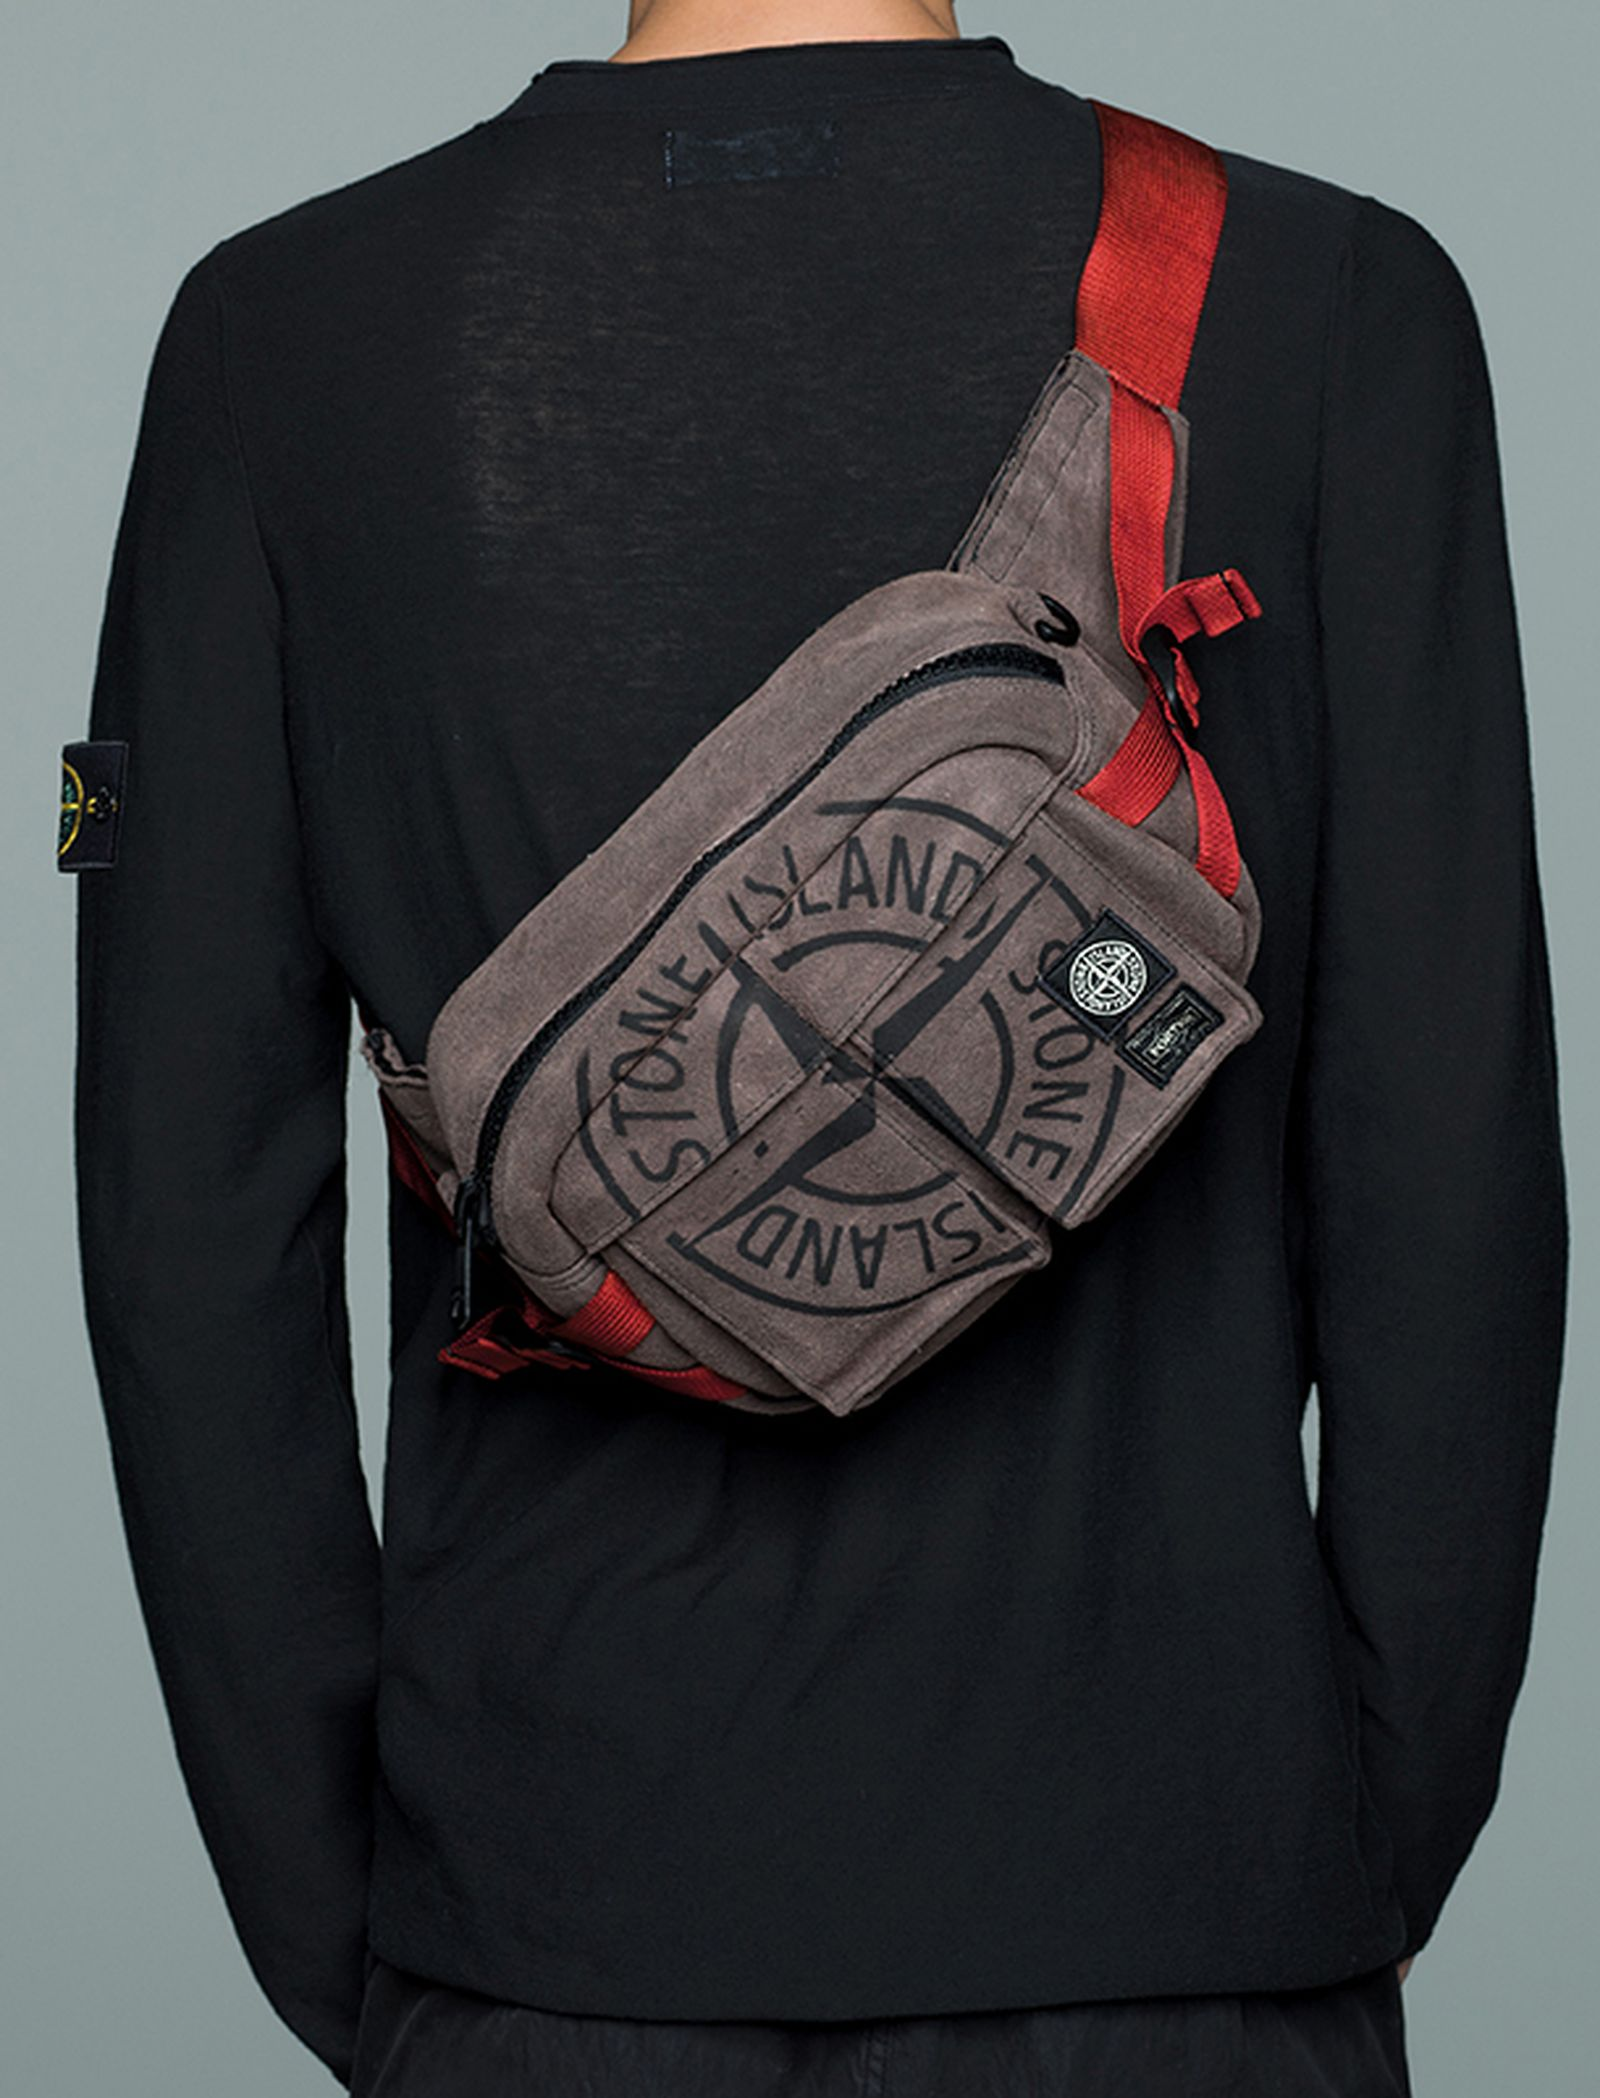 stone island porter garment dyed bags